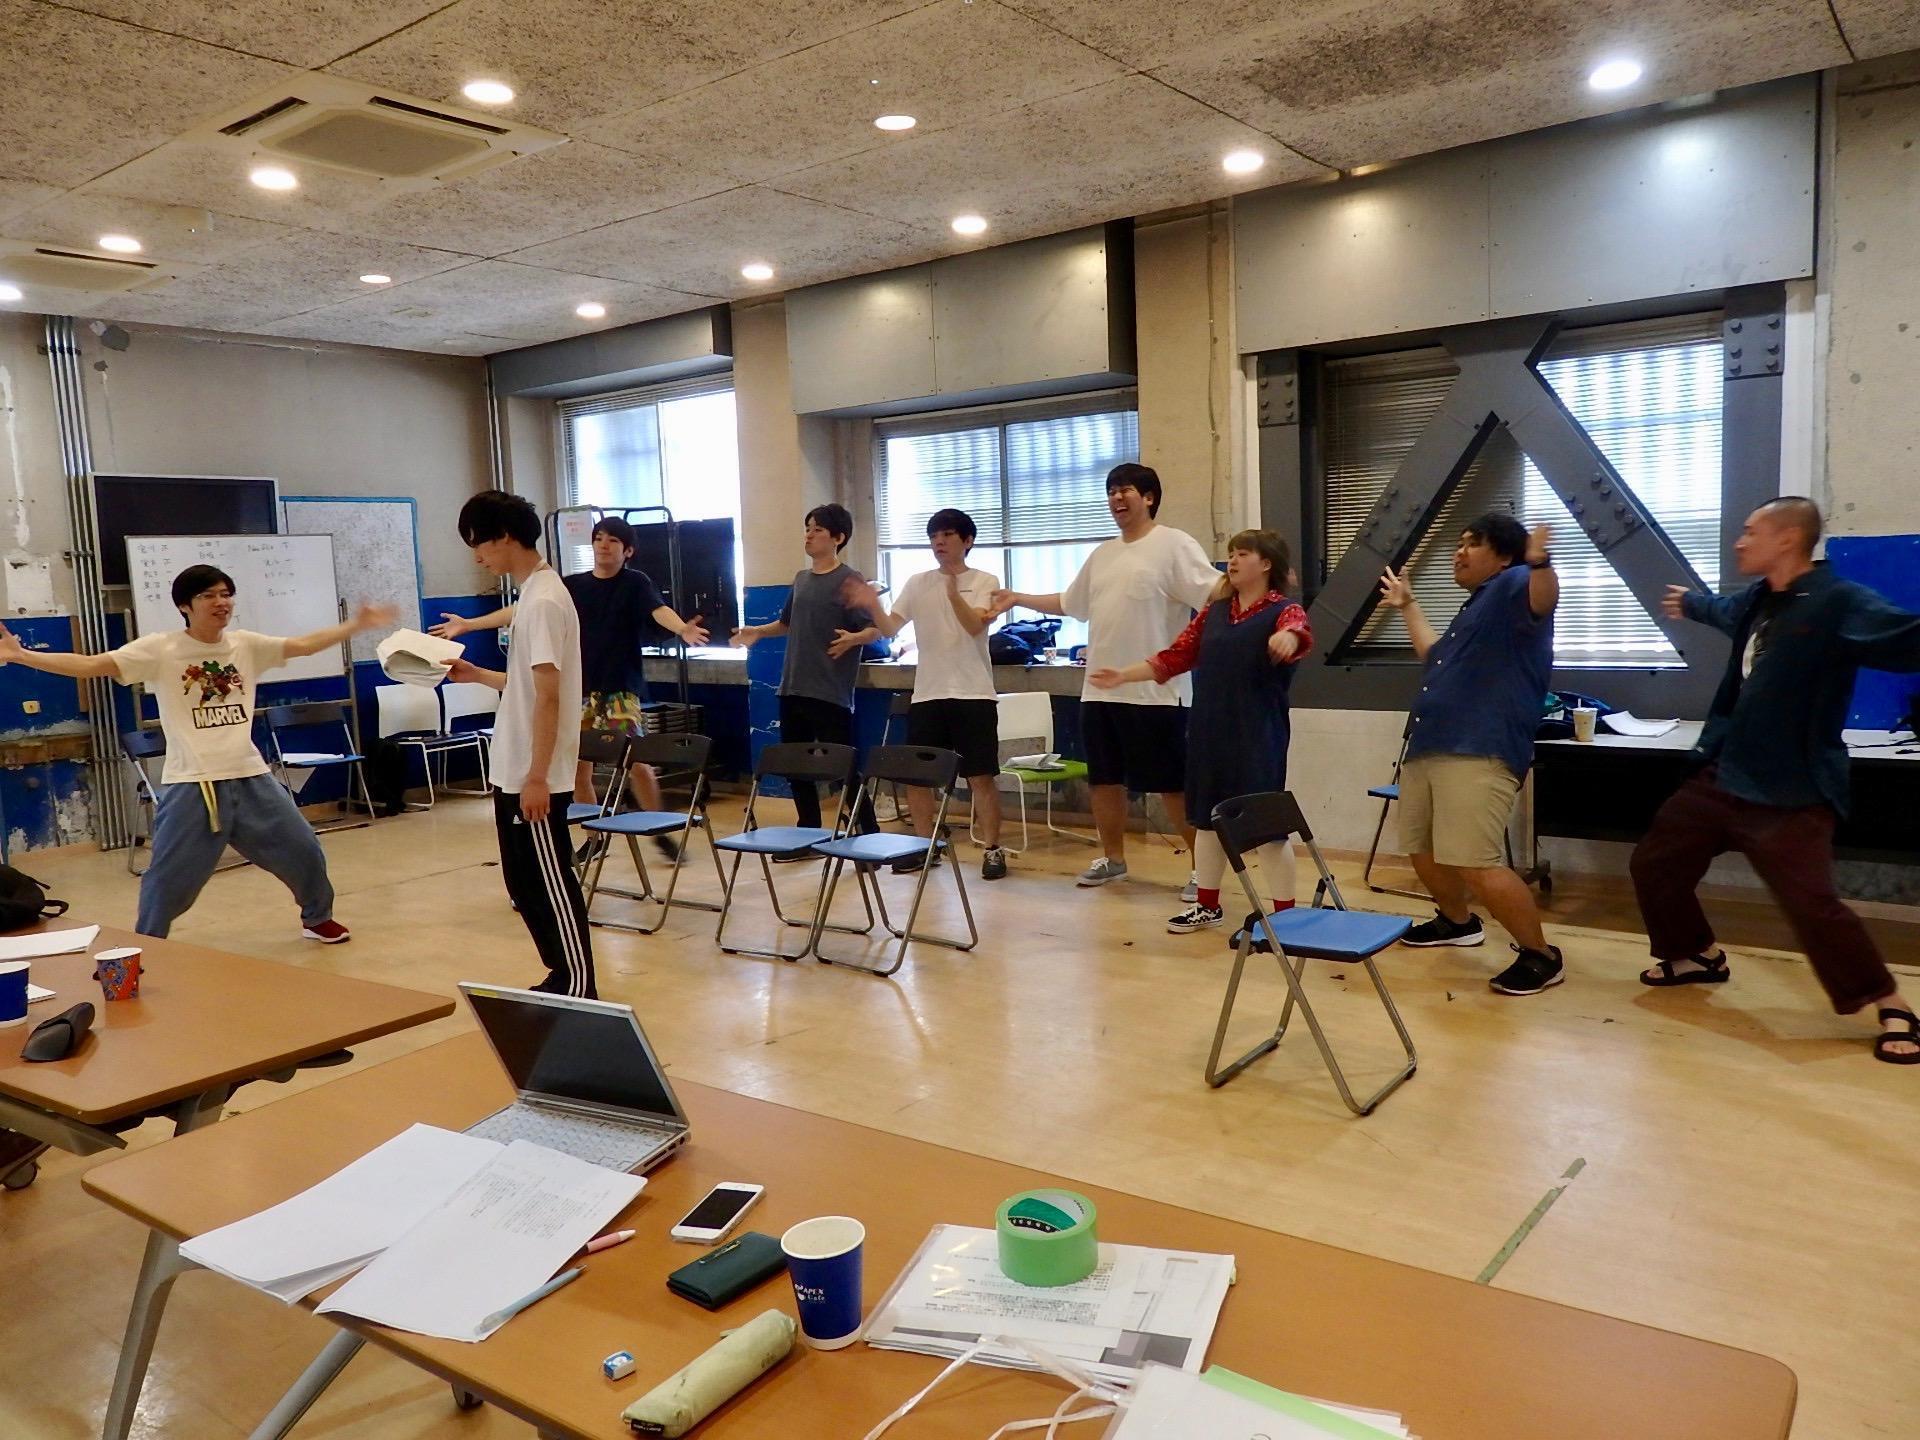 http://news.yoshimoto.co.jp/20180703053318-1fc3e2e642365500032267e4e2944bb78ca980bc.jpg